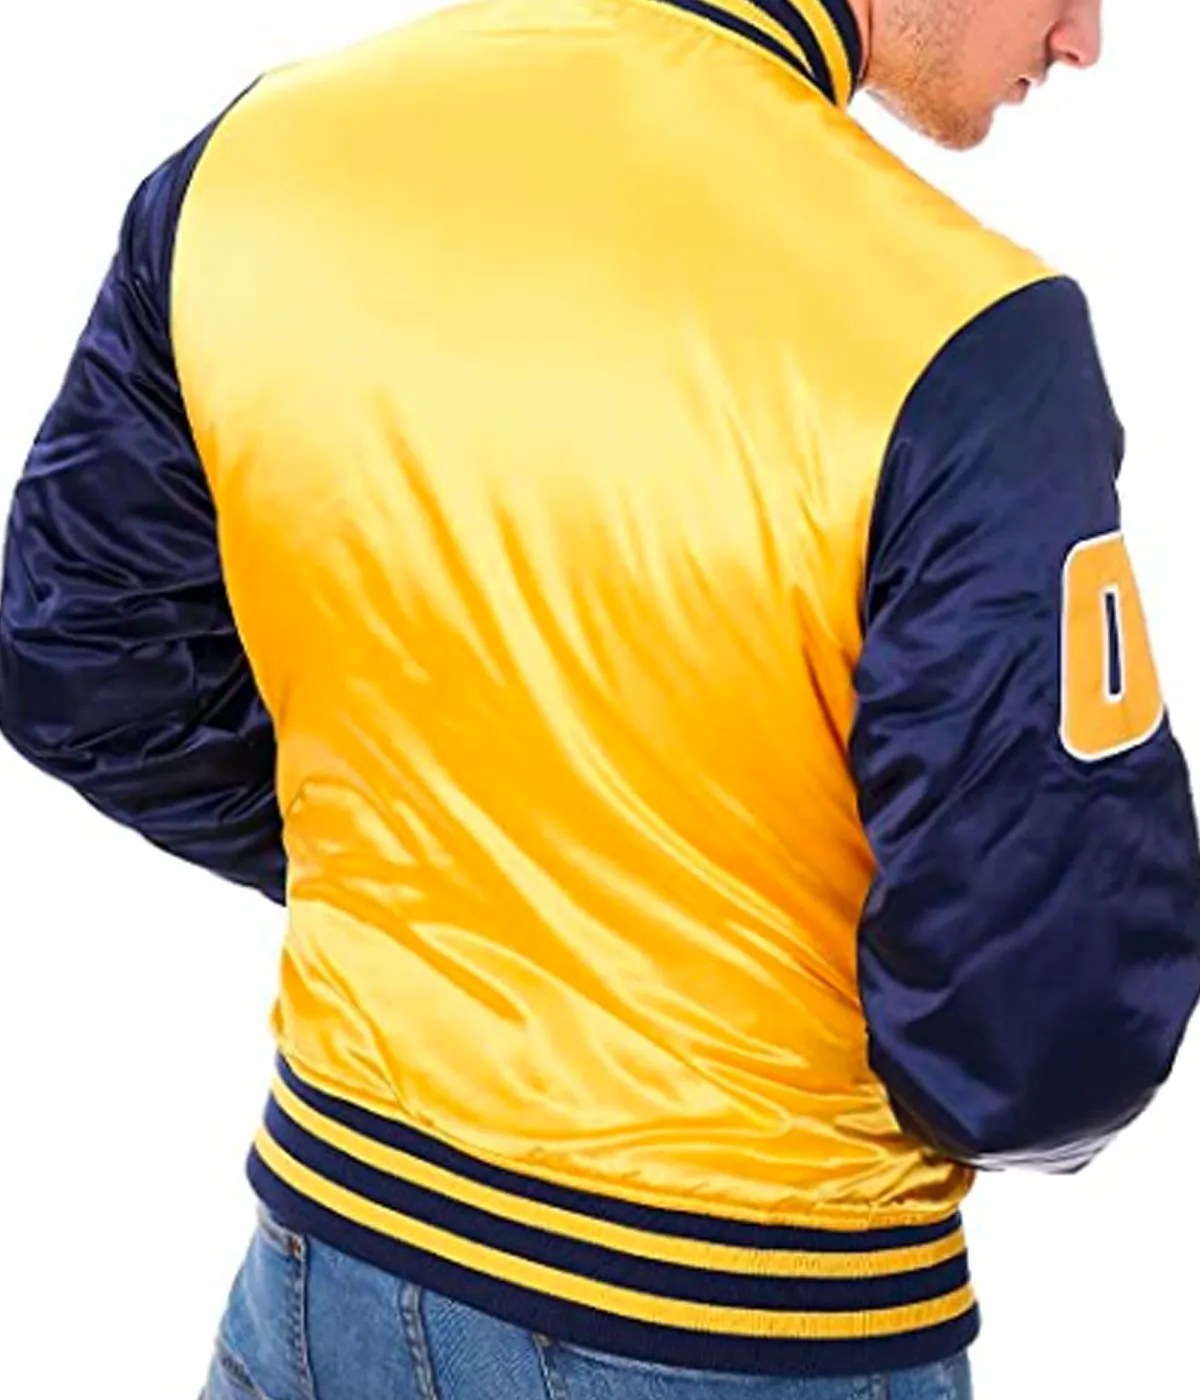 fubu-college-varsity-yellow-satin-jacket